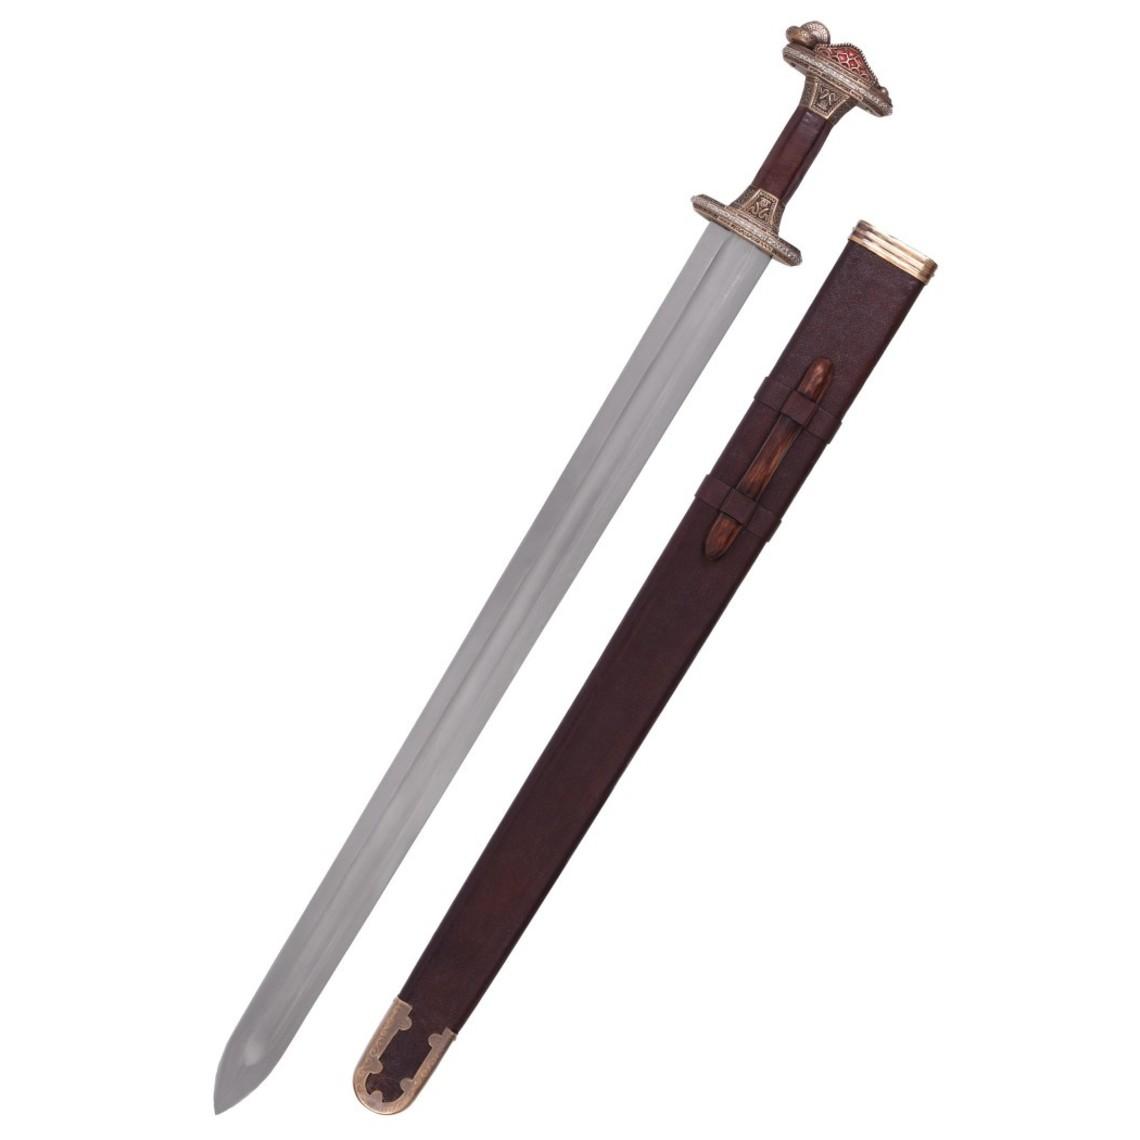 Deepeeka Vendel spada Uppsala settimo-ottavo secolo, impugnatura in ottone